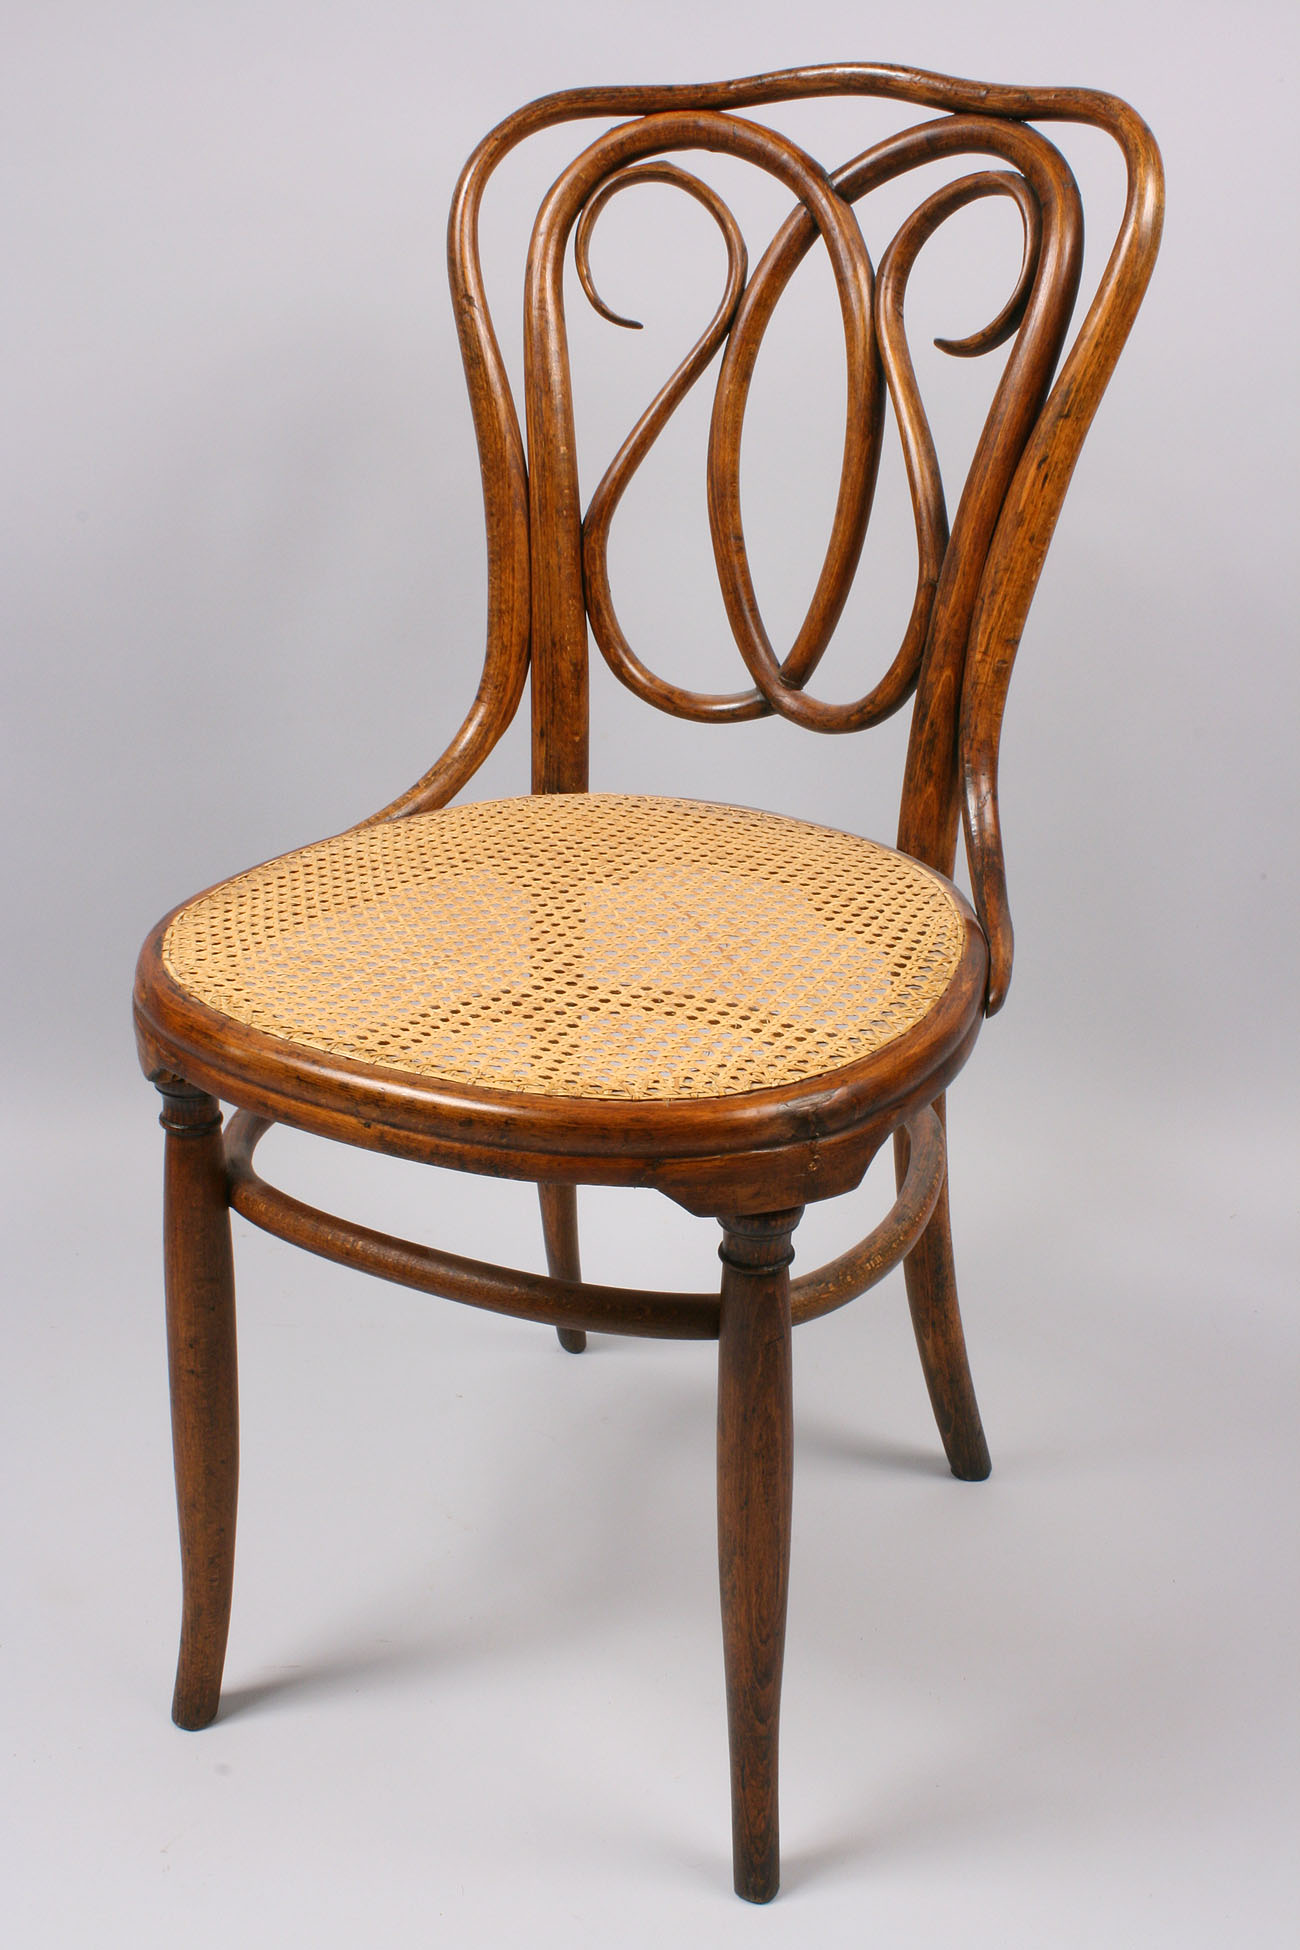 Brand-new Lot 146: J. & J. Kohn Bentwood chair BQ47